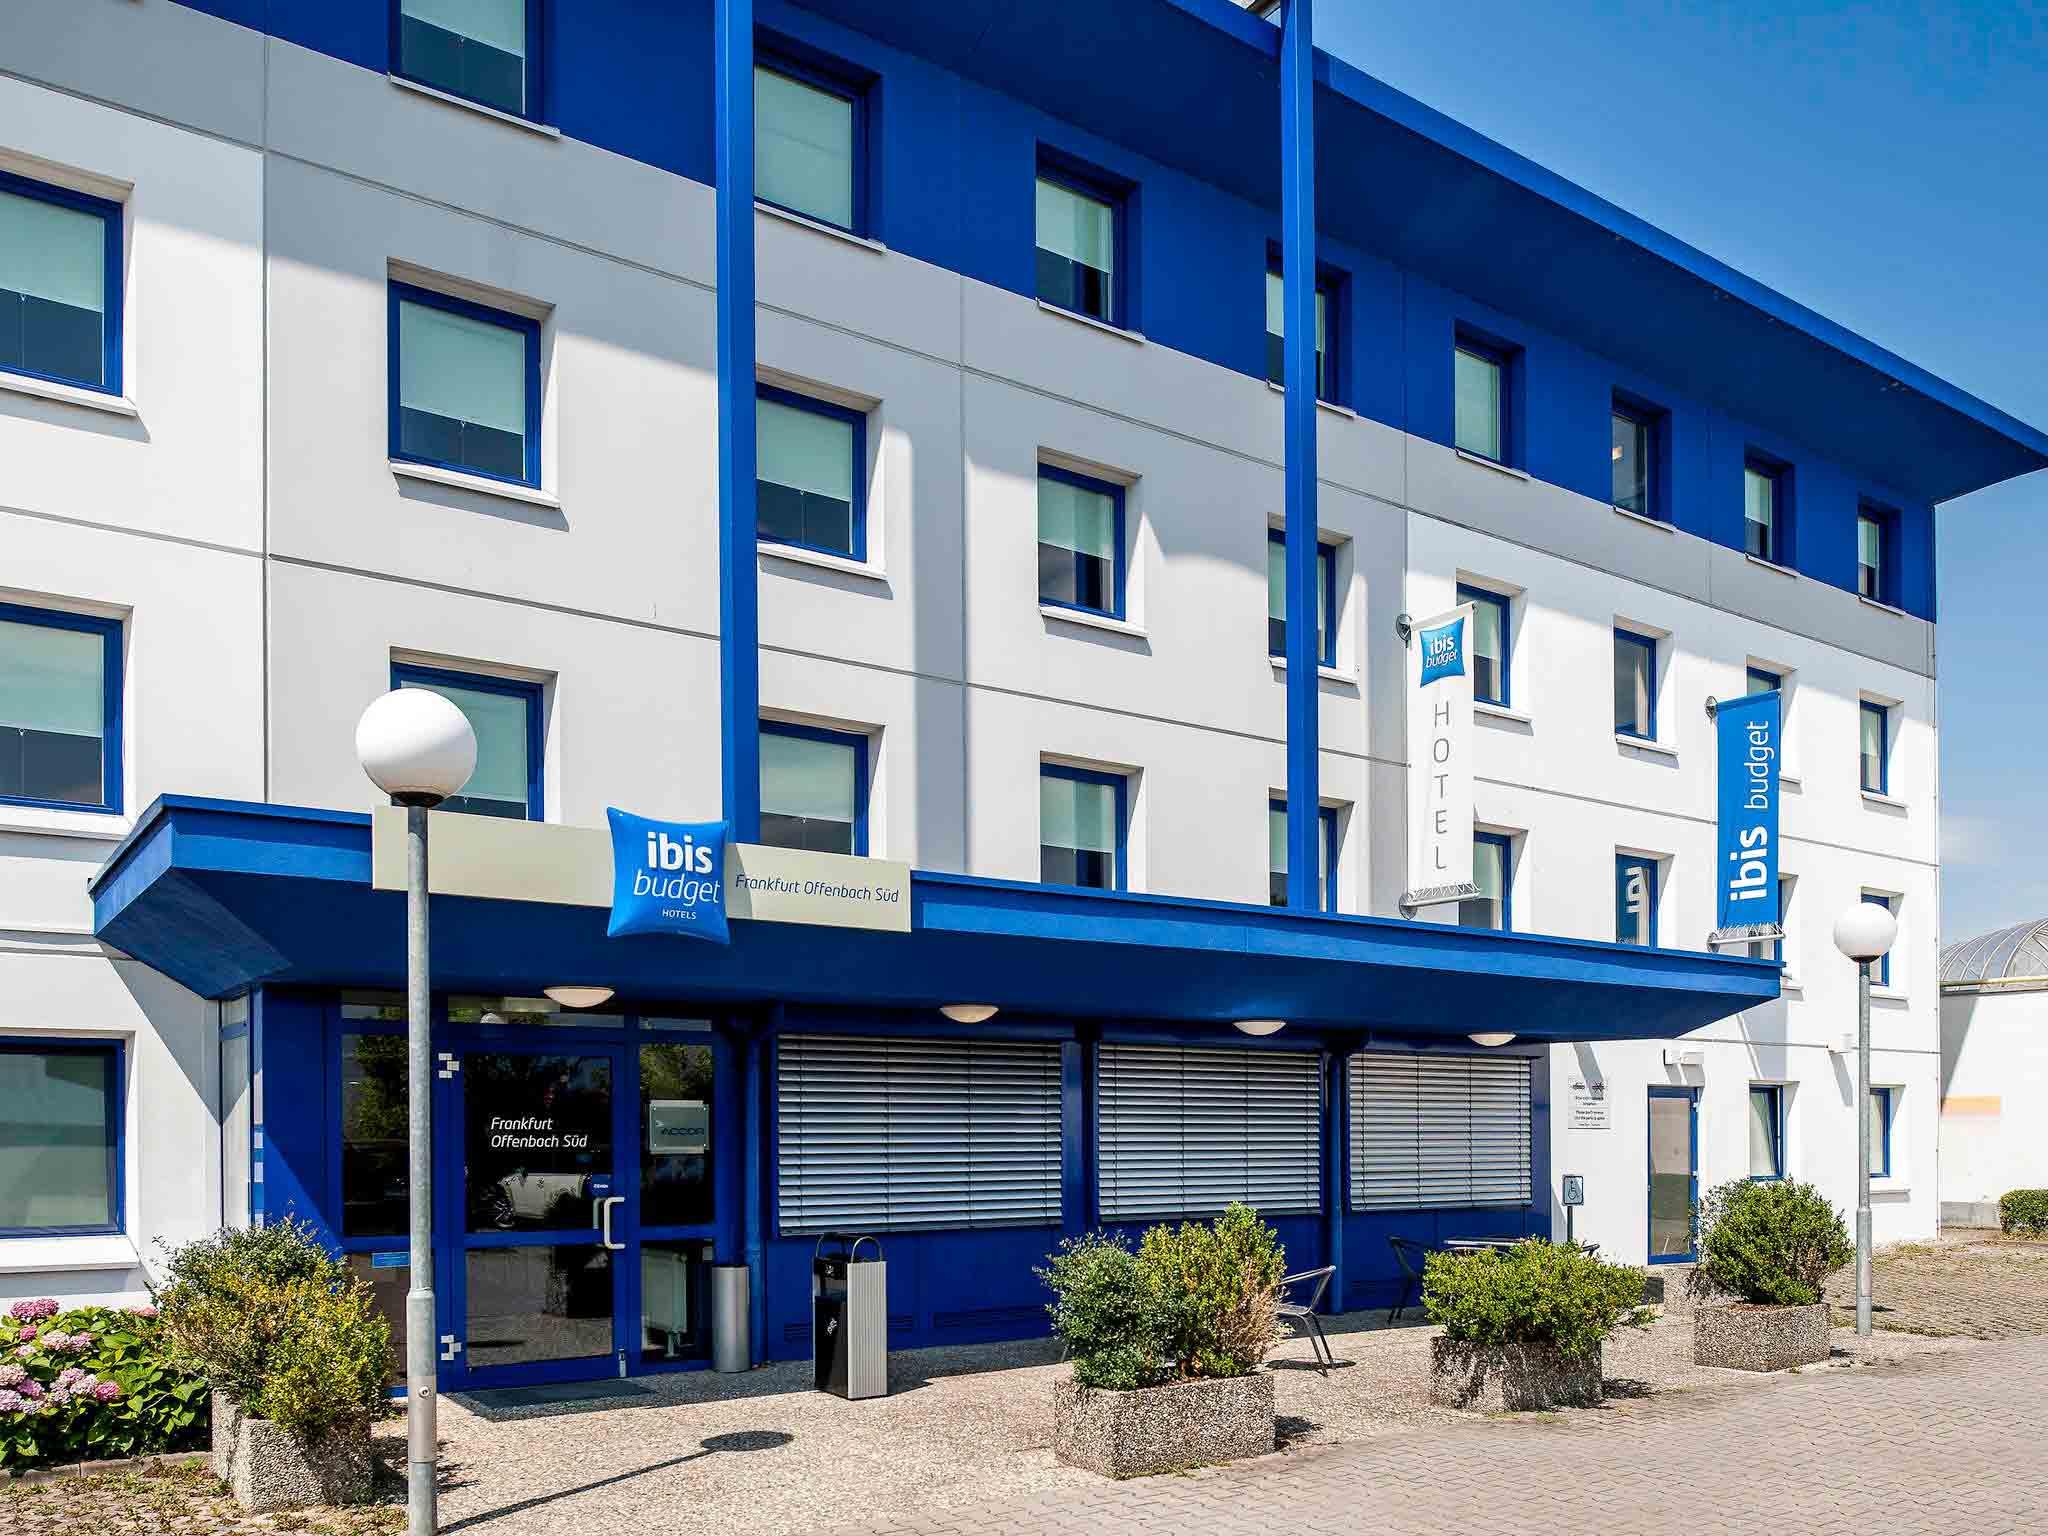 Hotell – ibis budget Frankfurt Offenbach Sued